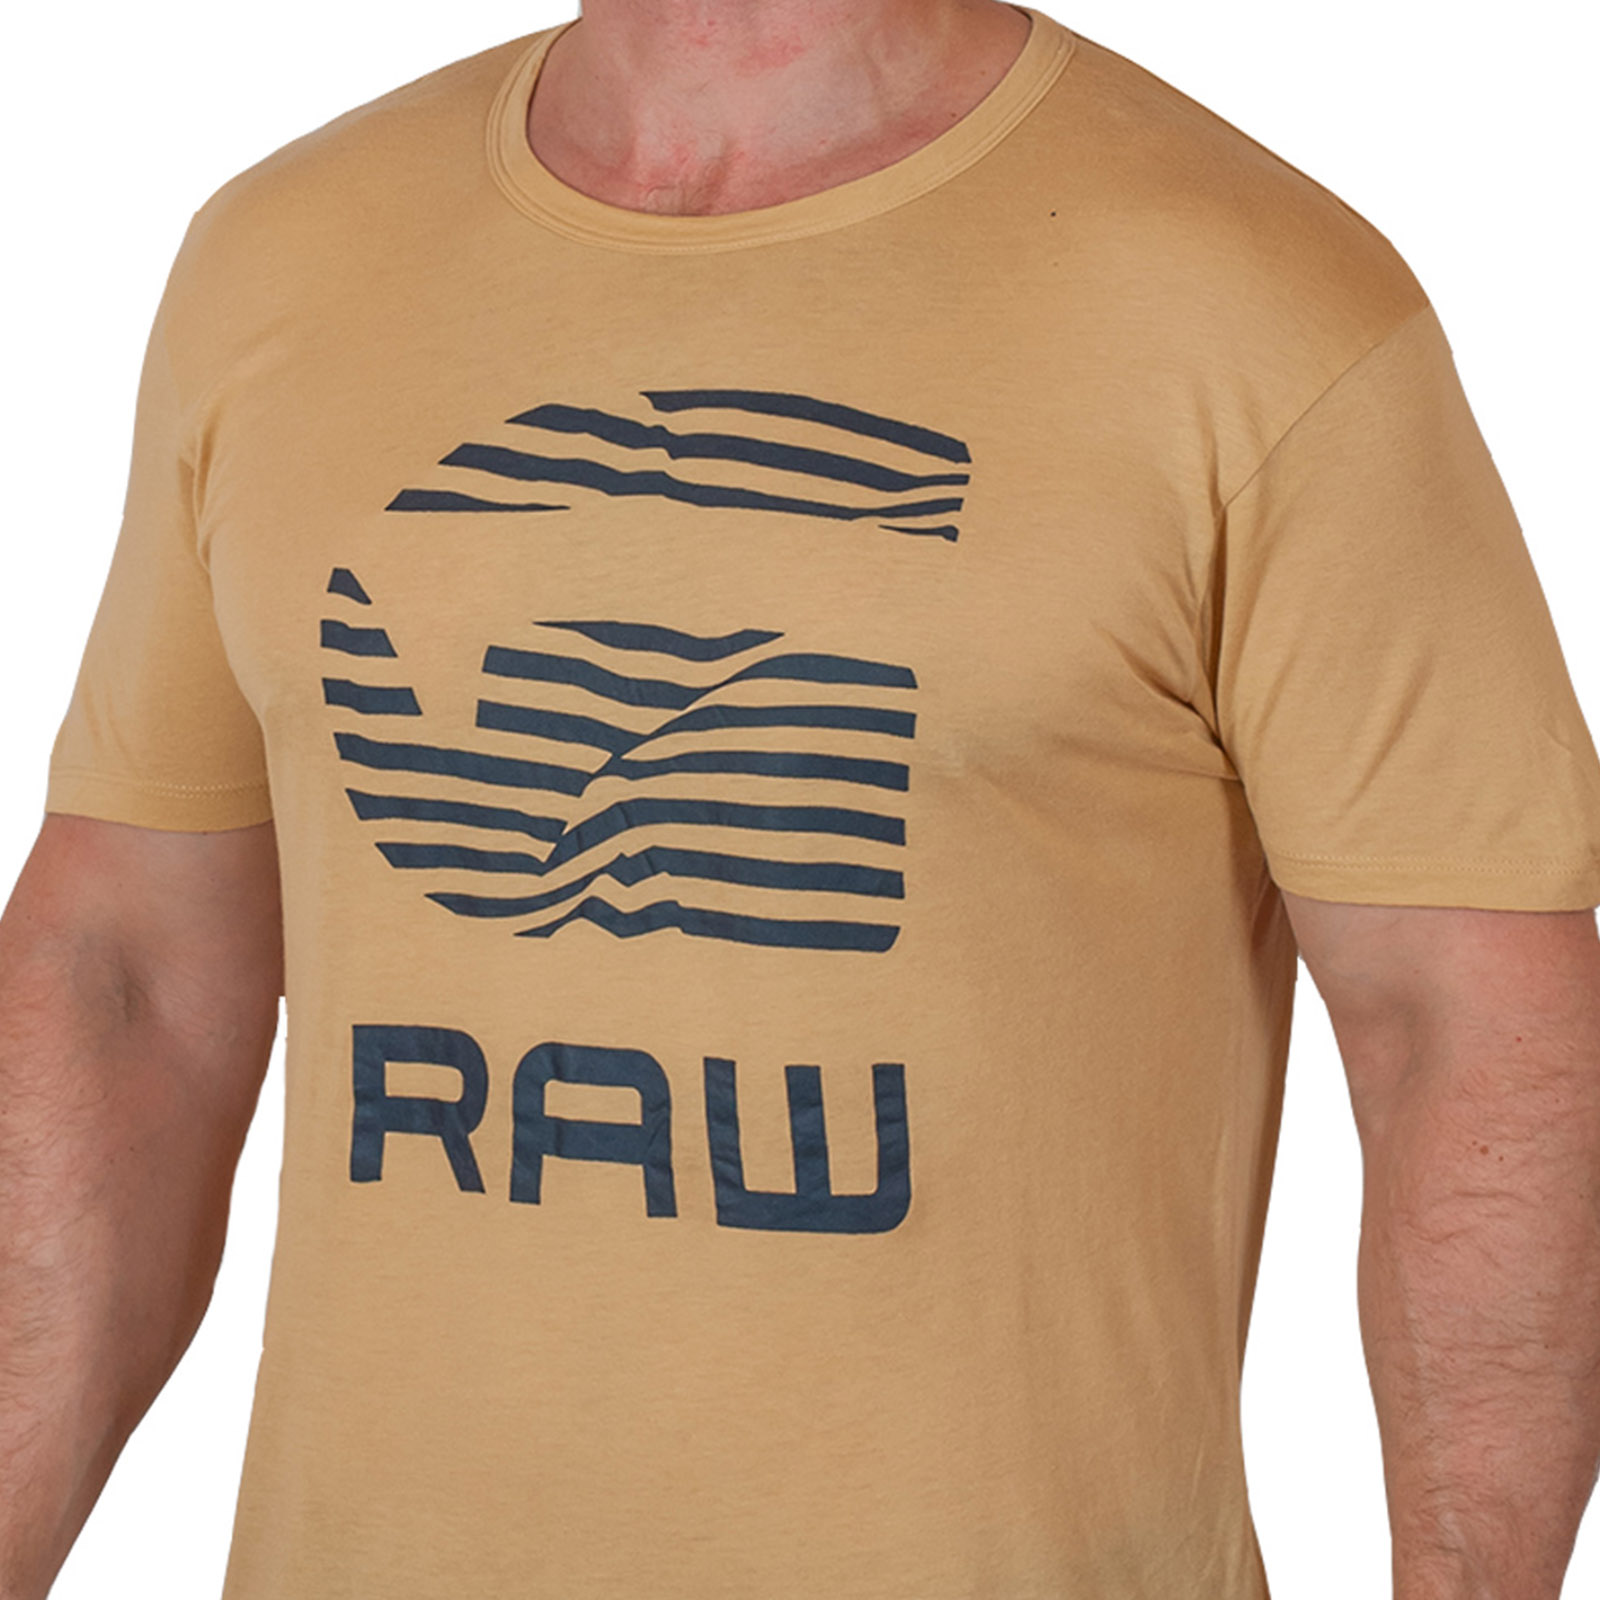 Удобная футболка от бренда G-Star Raw® Radcort (Голландия) N517